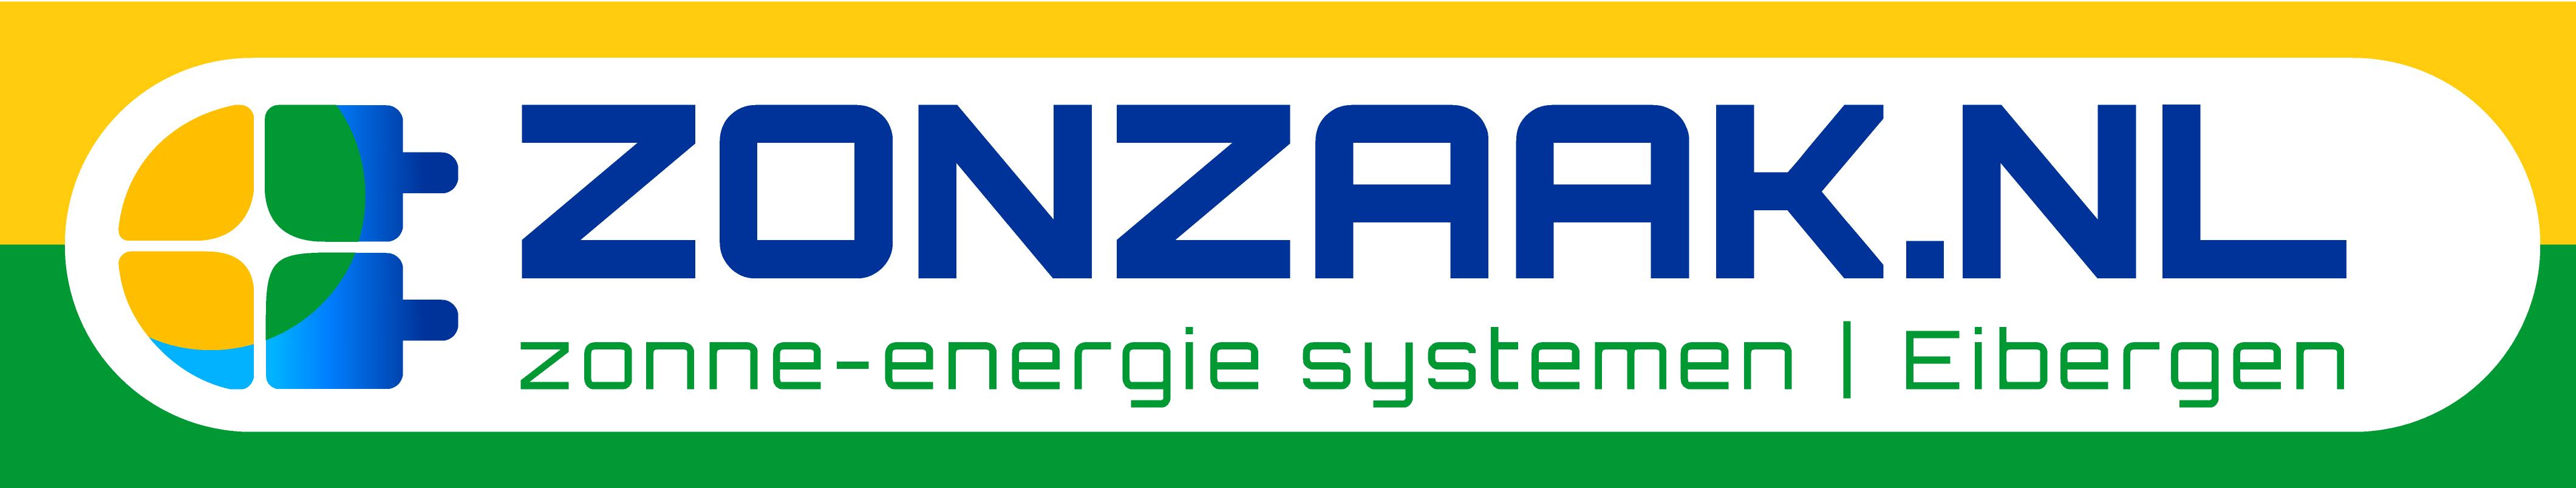 ZONZAAK.NL